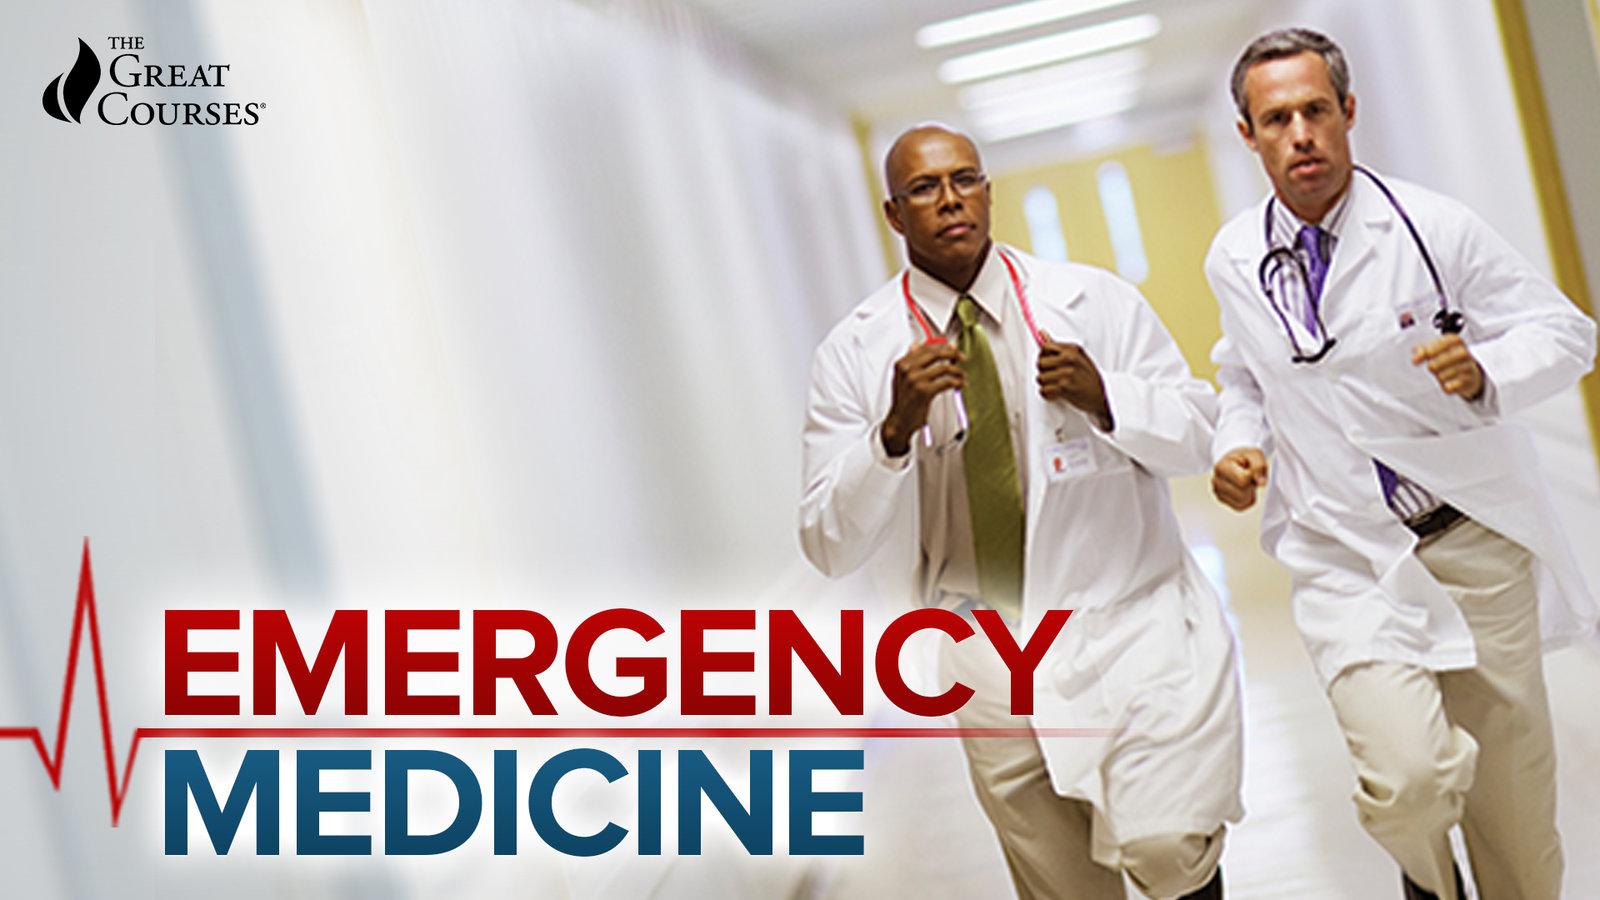 Medical School for Everyone - Emergency Medicine